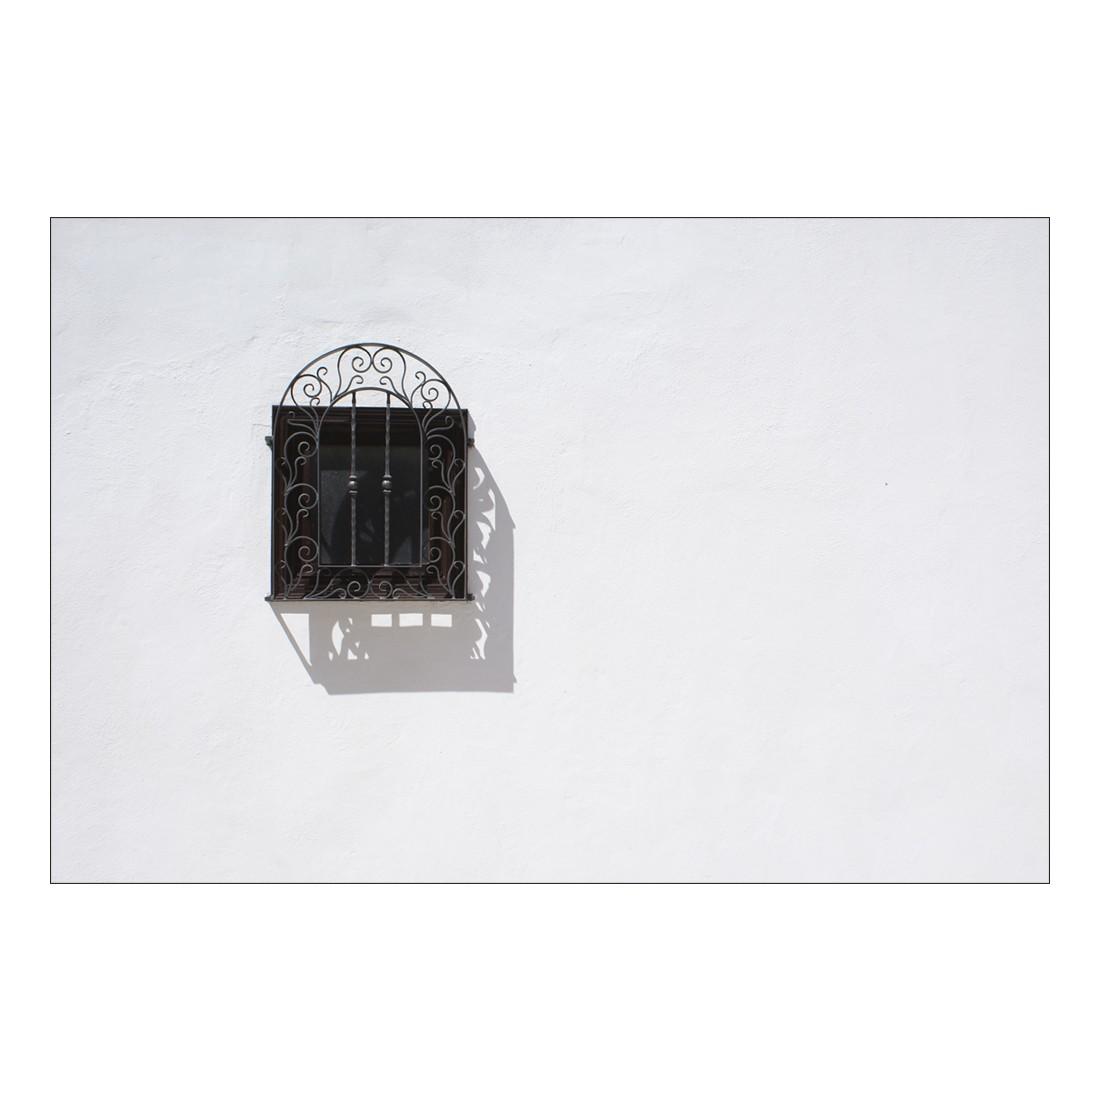 Leinwandbild SURREAL WINDOW – Abmessung 100 x 75 cm, Gallery of Innovative Art günstig